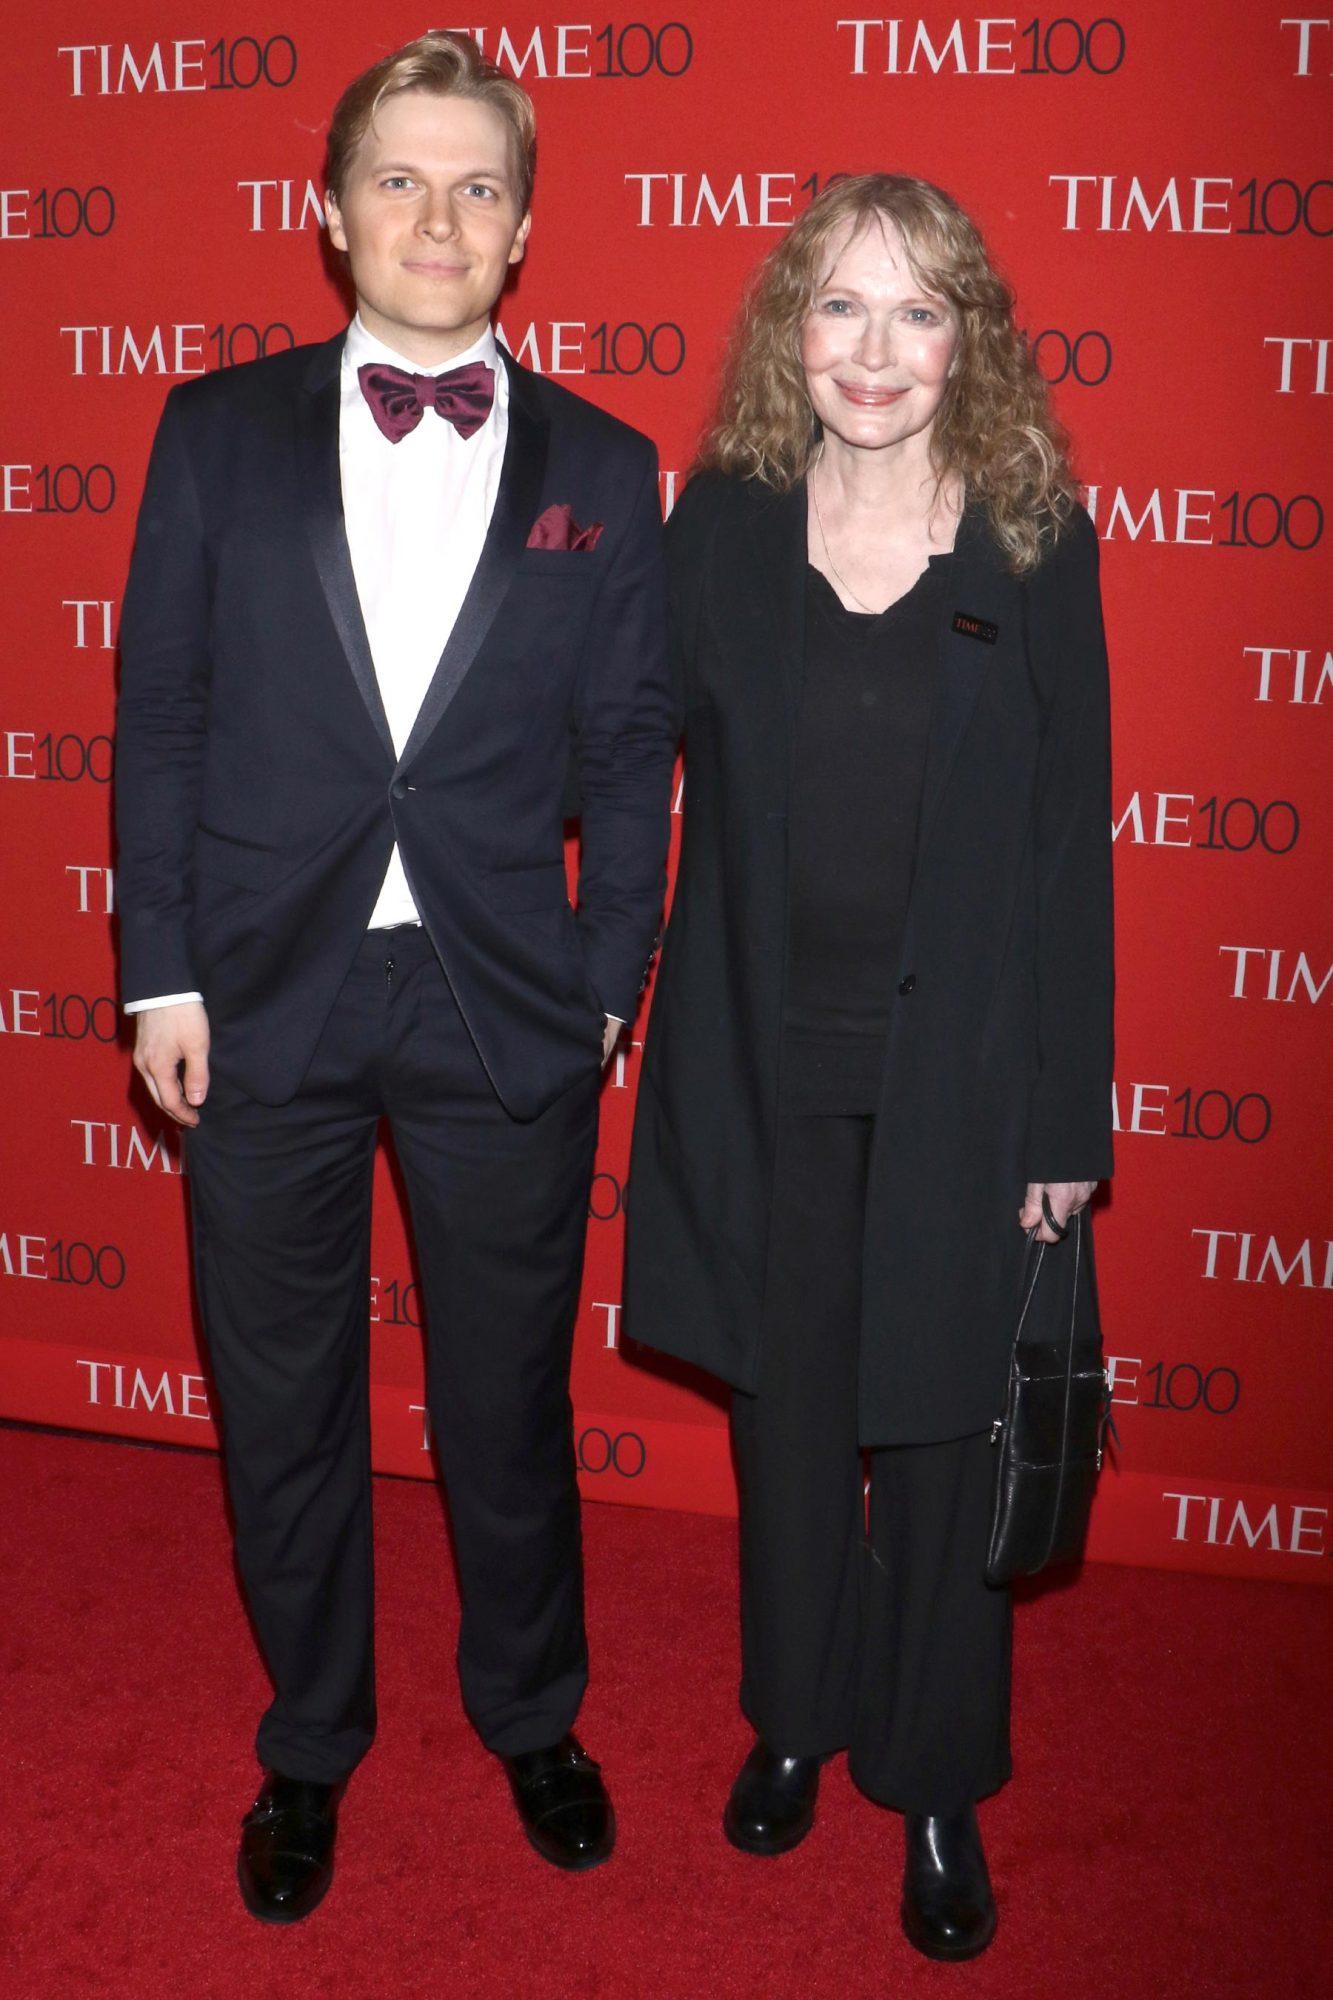 Time 100 Gala, Arrivals, New York, USA - 25 Apr 2017